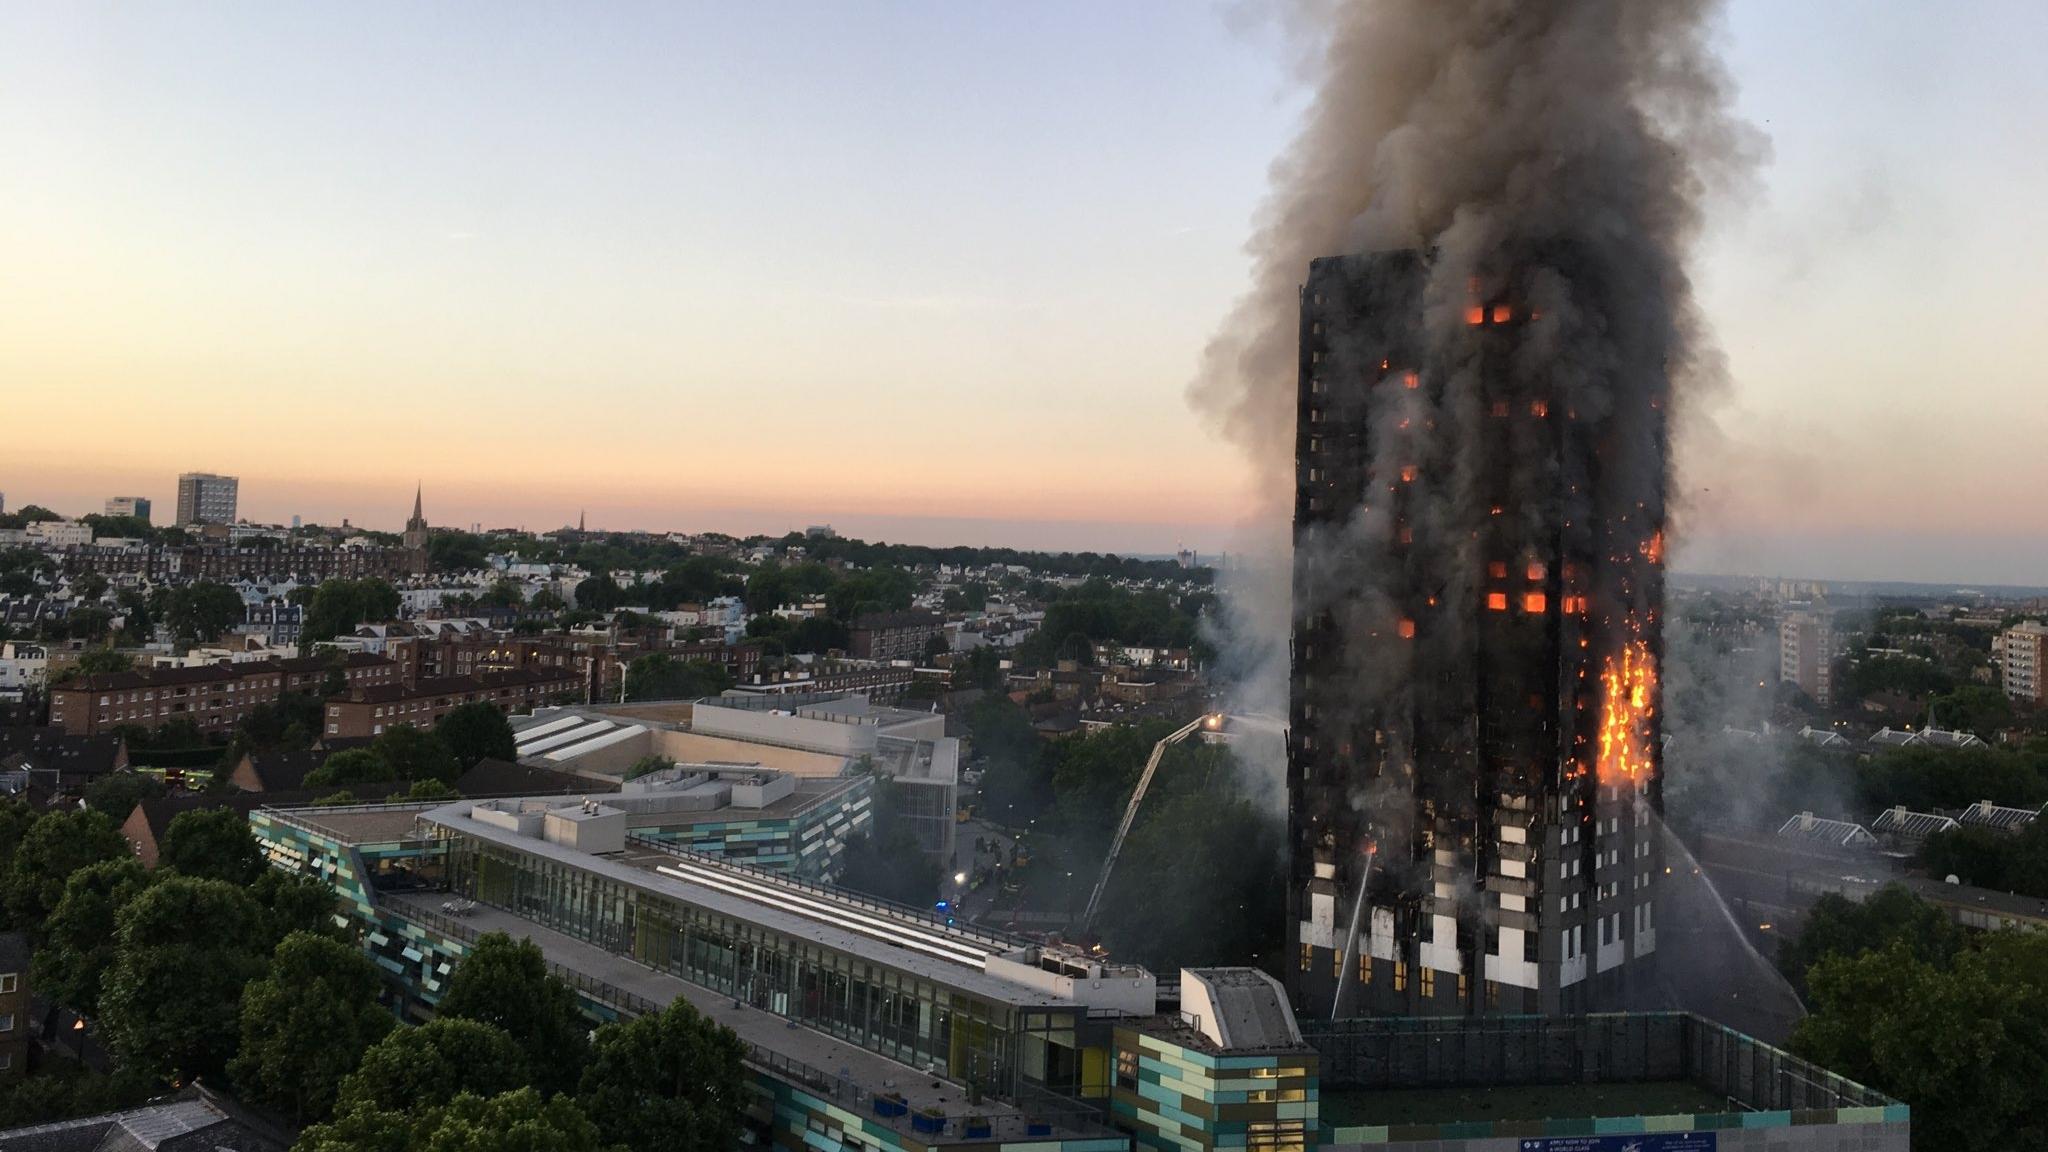 Grenfell_Tower_fire_(wider_view).jpg